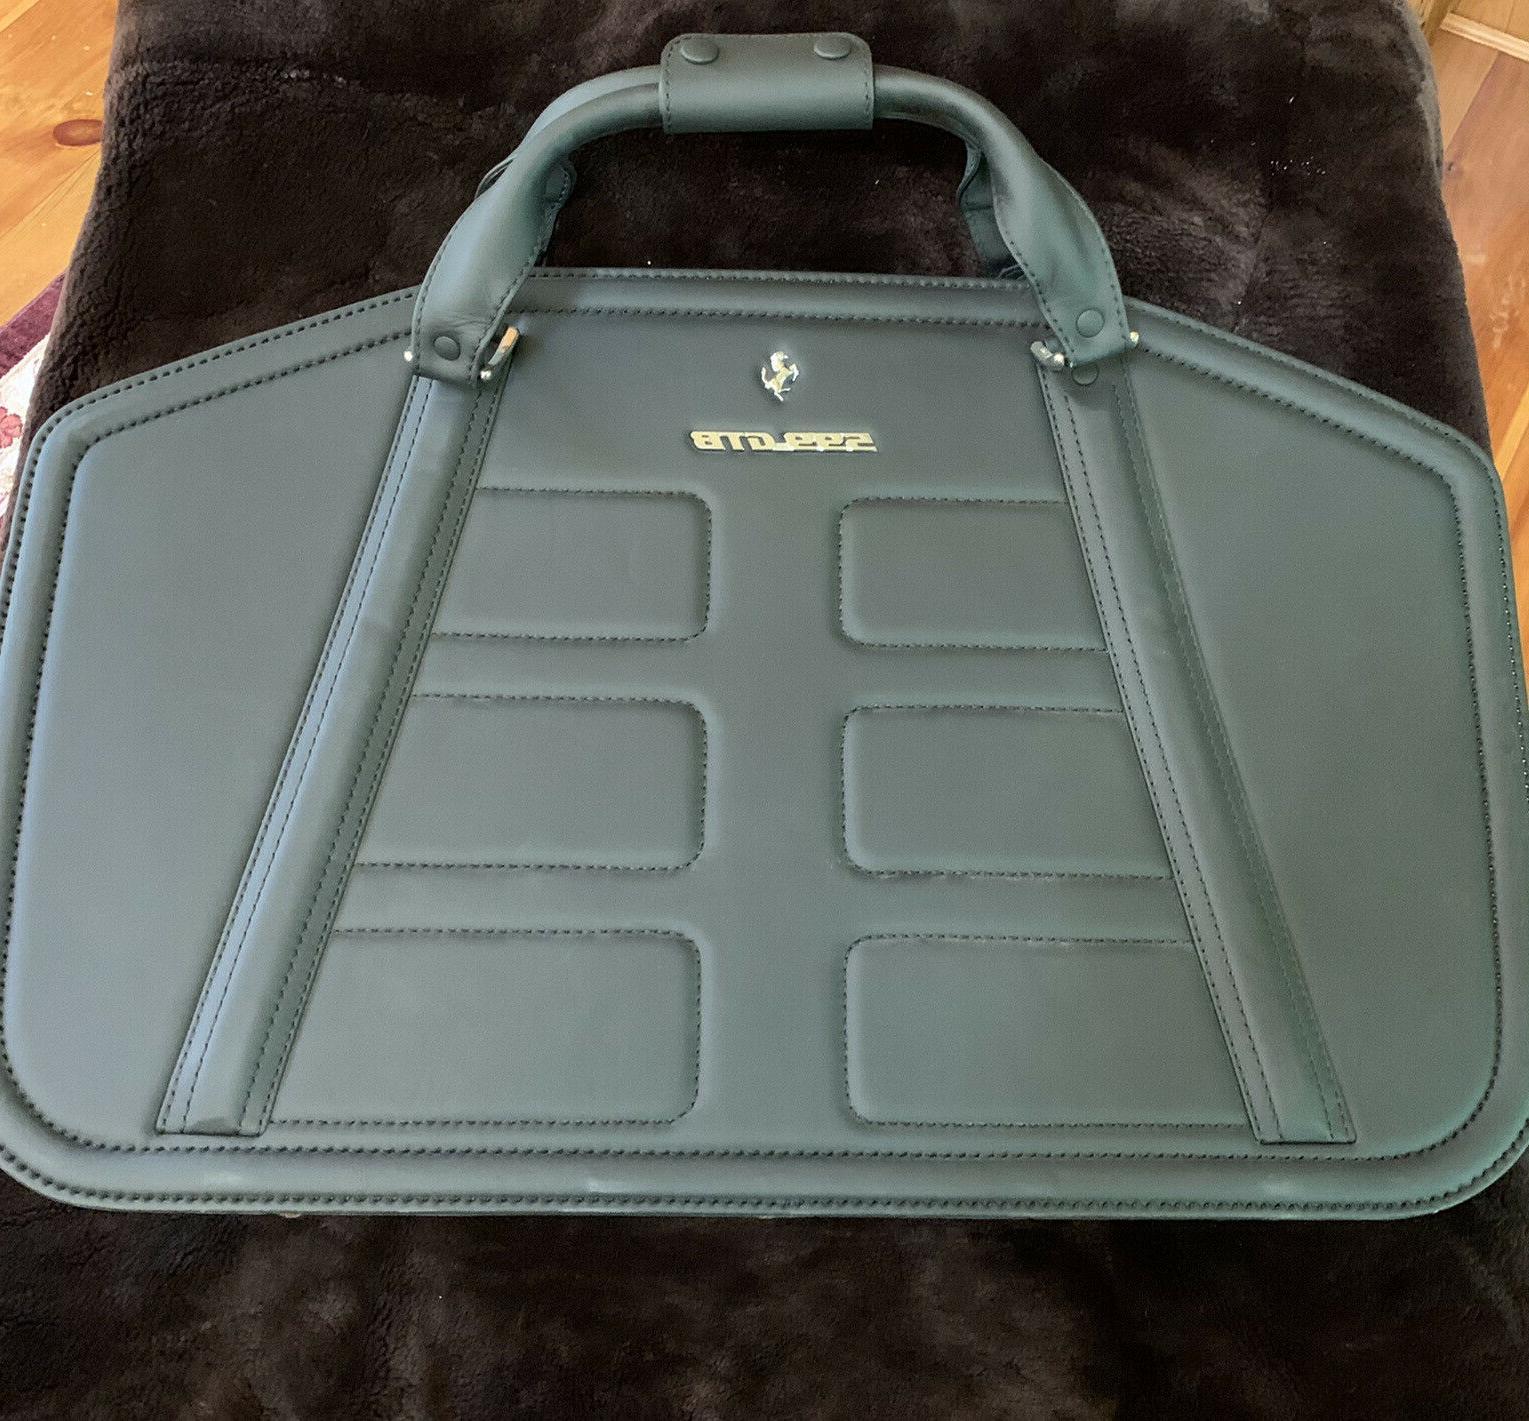 599gtb 4 piece travel luggage set